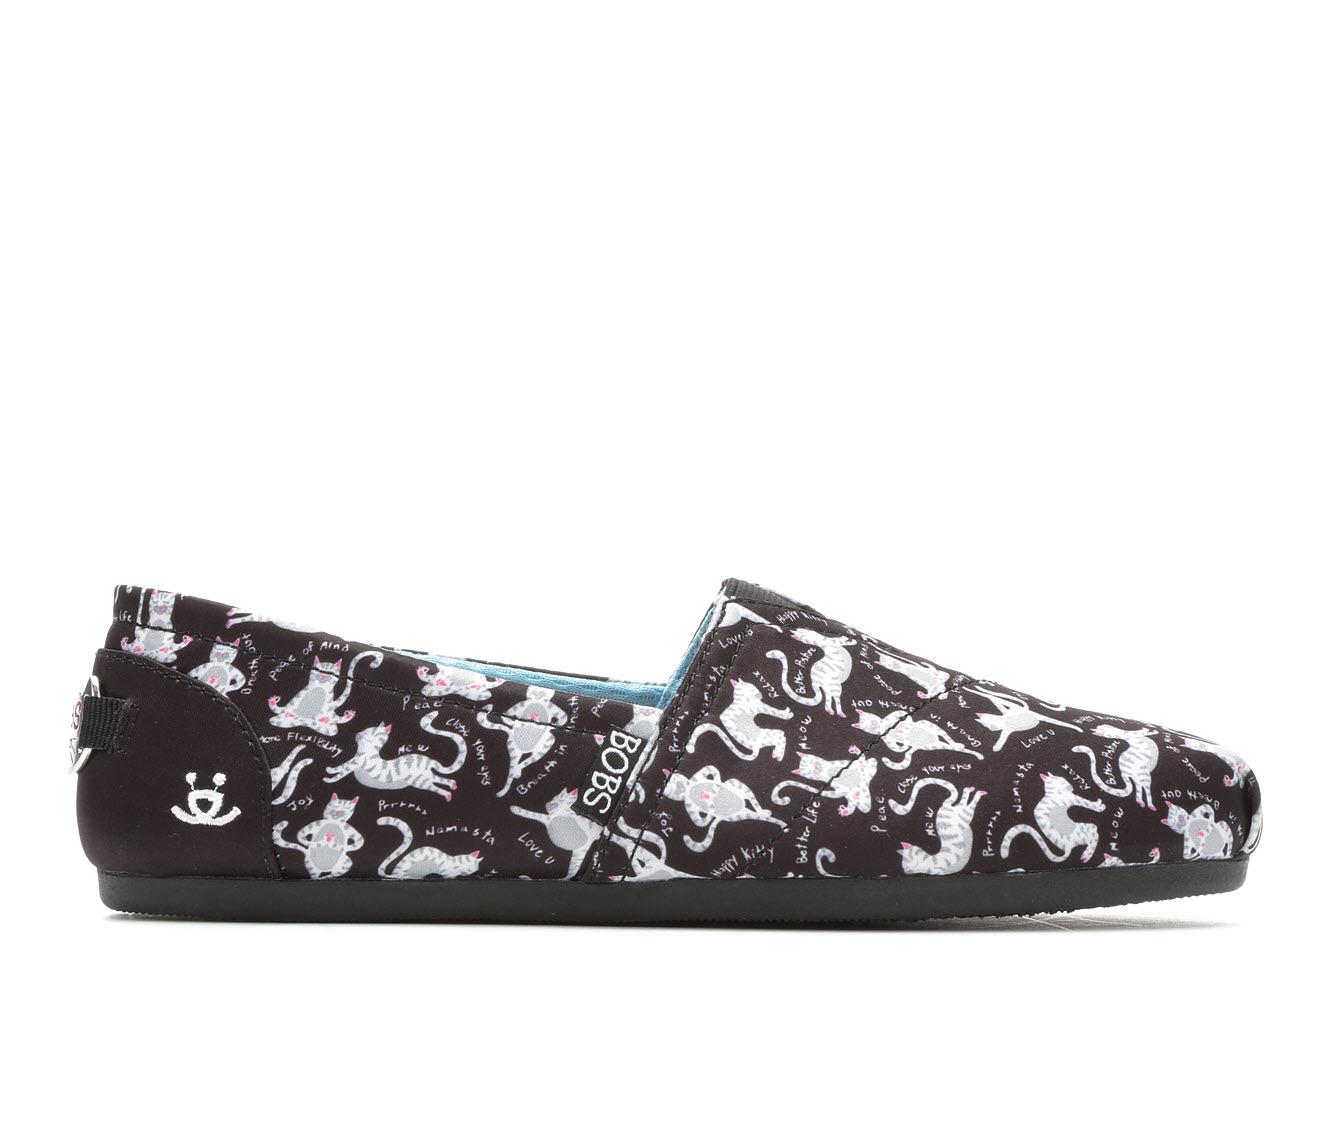 Women's BOBS Yoga Kitties 32560 Sport Shoes (Black - Size 5.5) 1715639